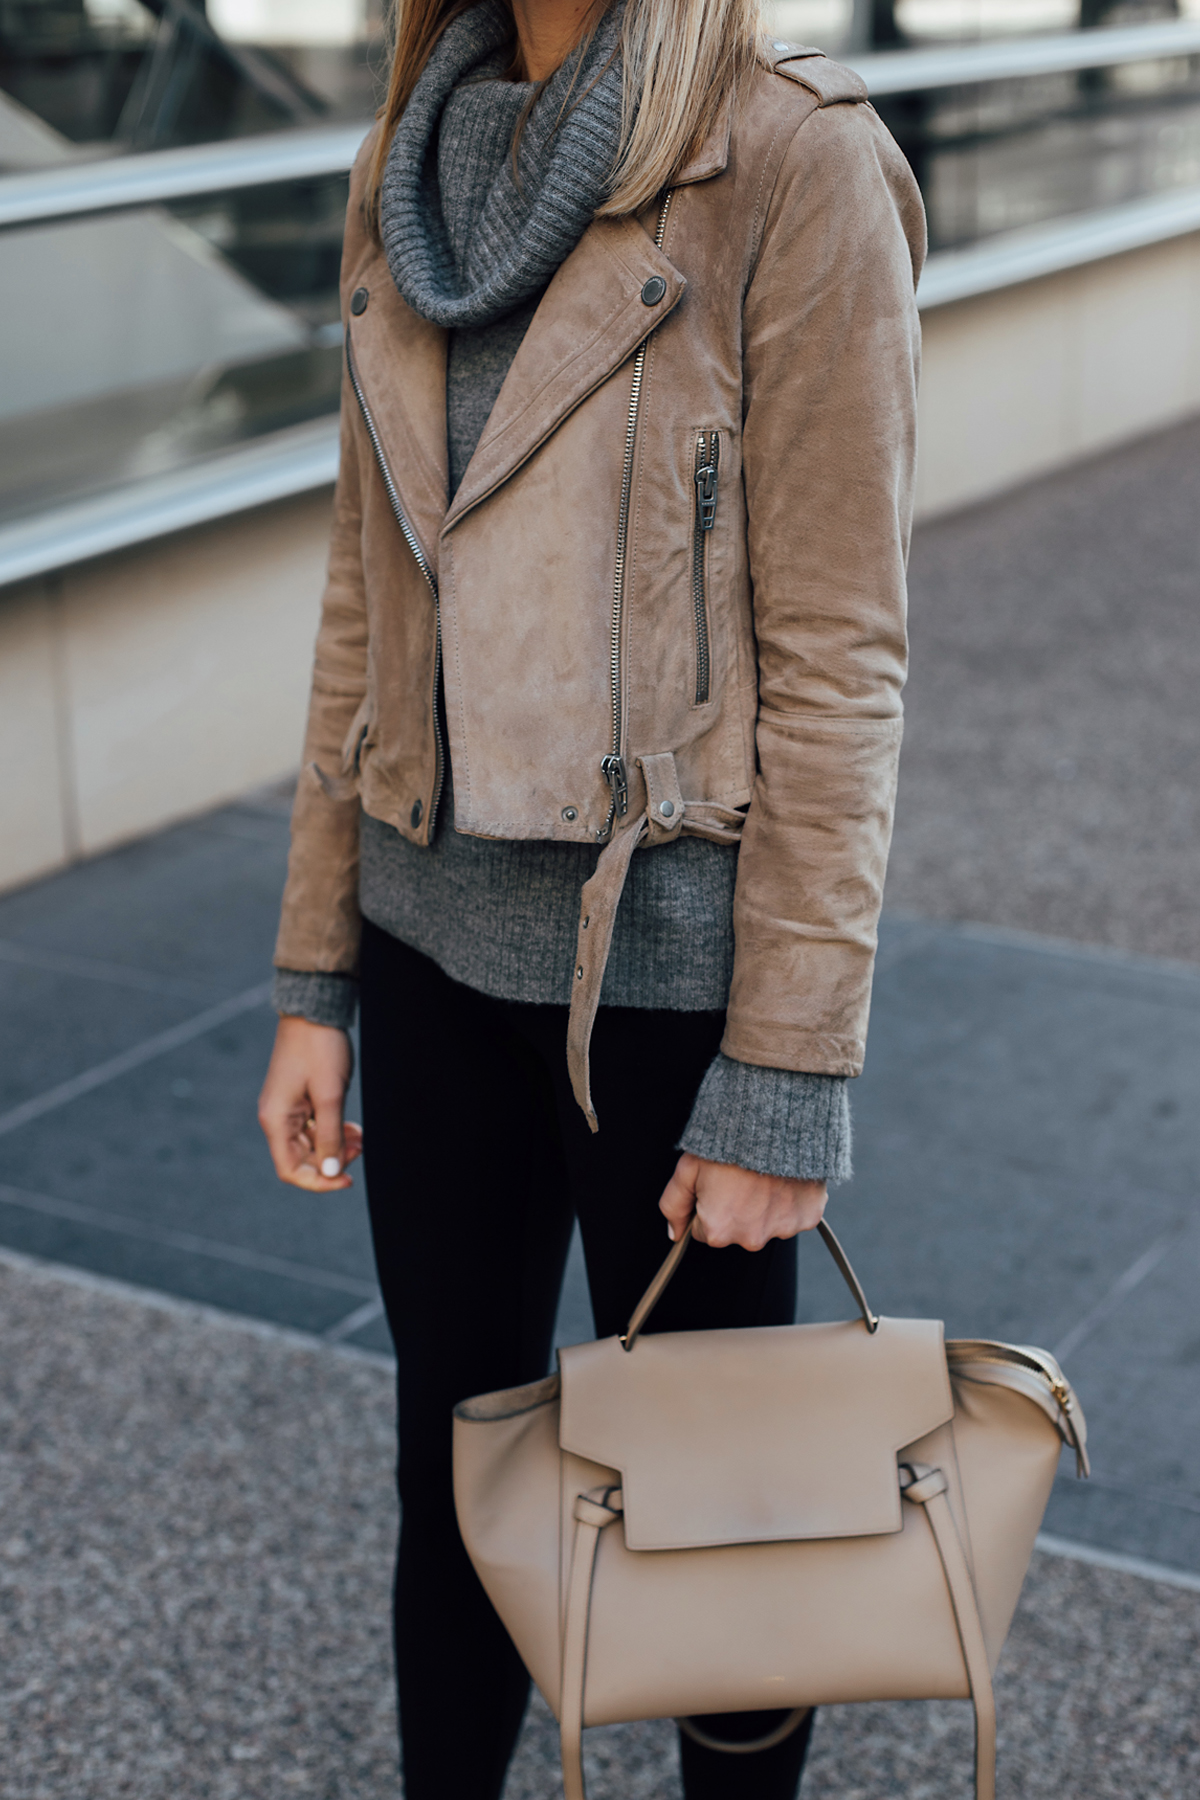 Woman Wearing Blanknyc Tan Suede Moto Jacket Grey Turtleneck Sweater Black Leggings Celine Mini Belt Bag Fashion Jackson San Diego Fashion Blogger Street Style